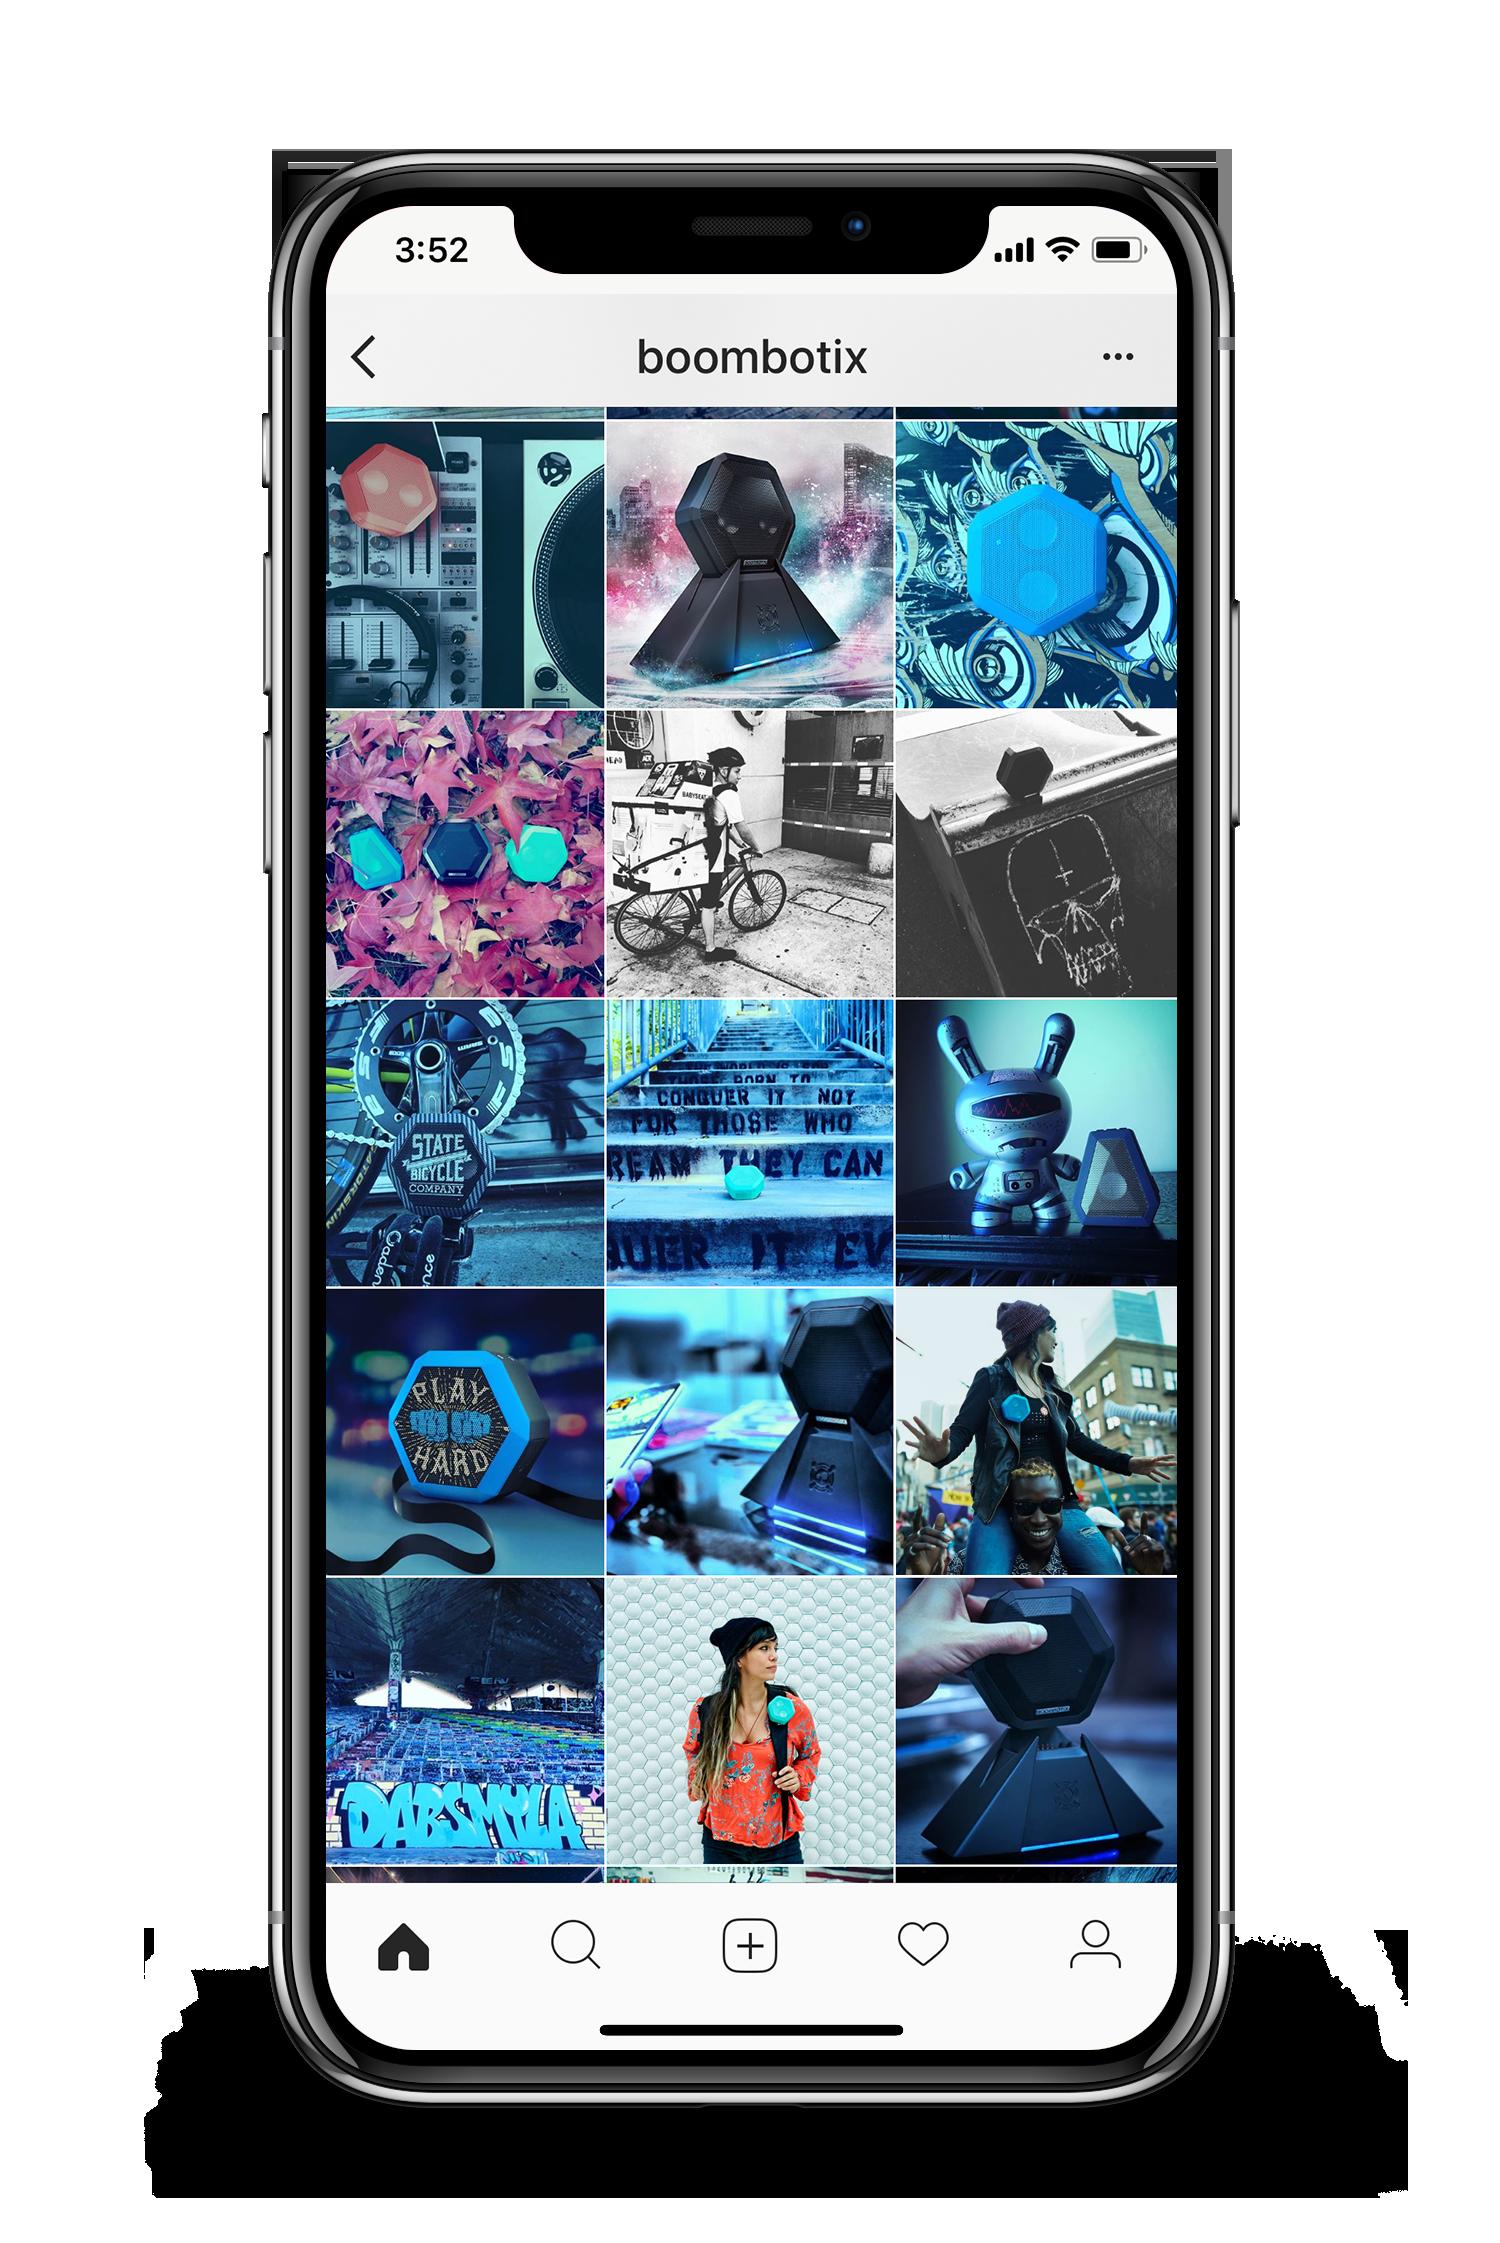 Boombotix instagram feed being displayed on smartphone